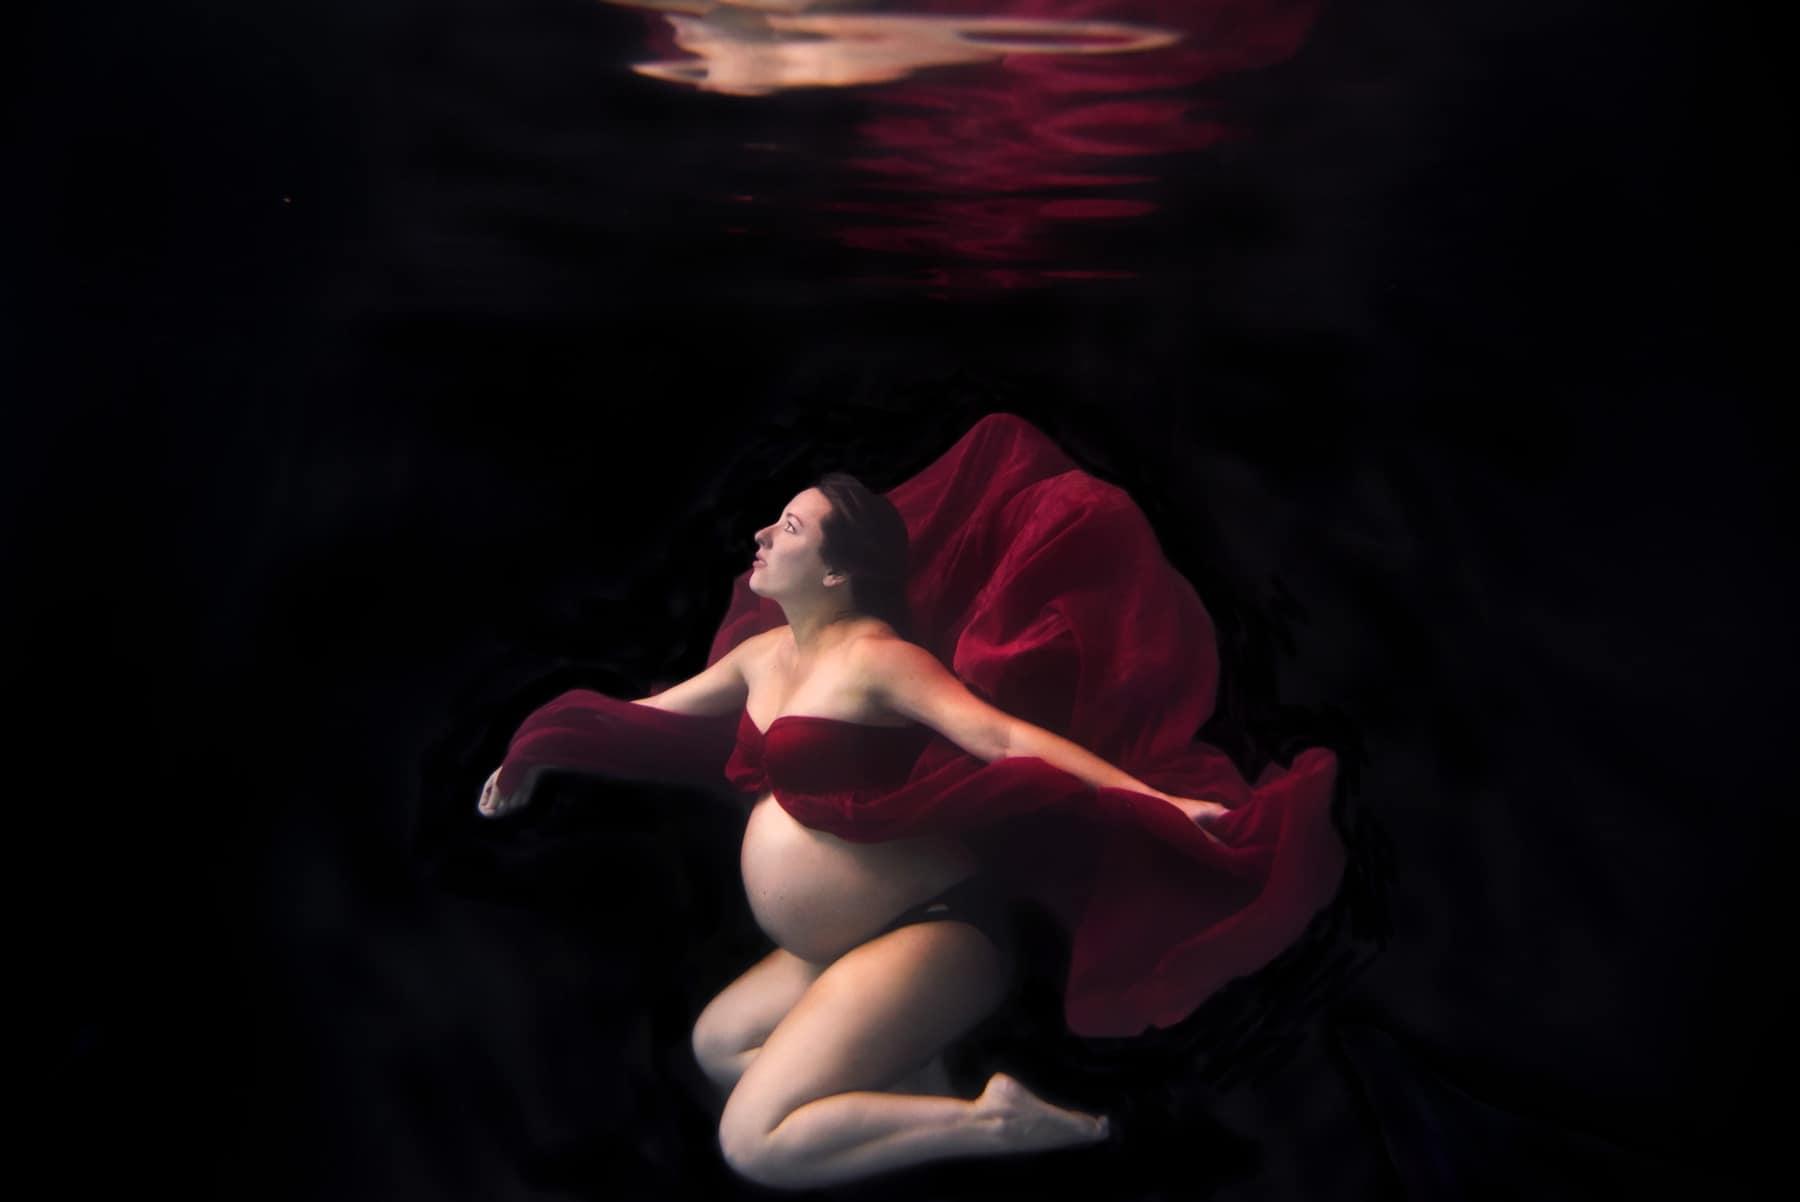 Underwater Maternity Photographer Denver Colorado